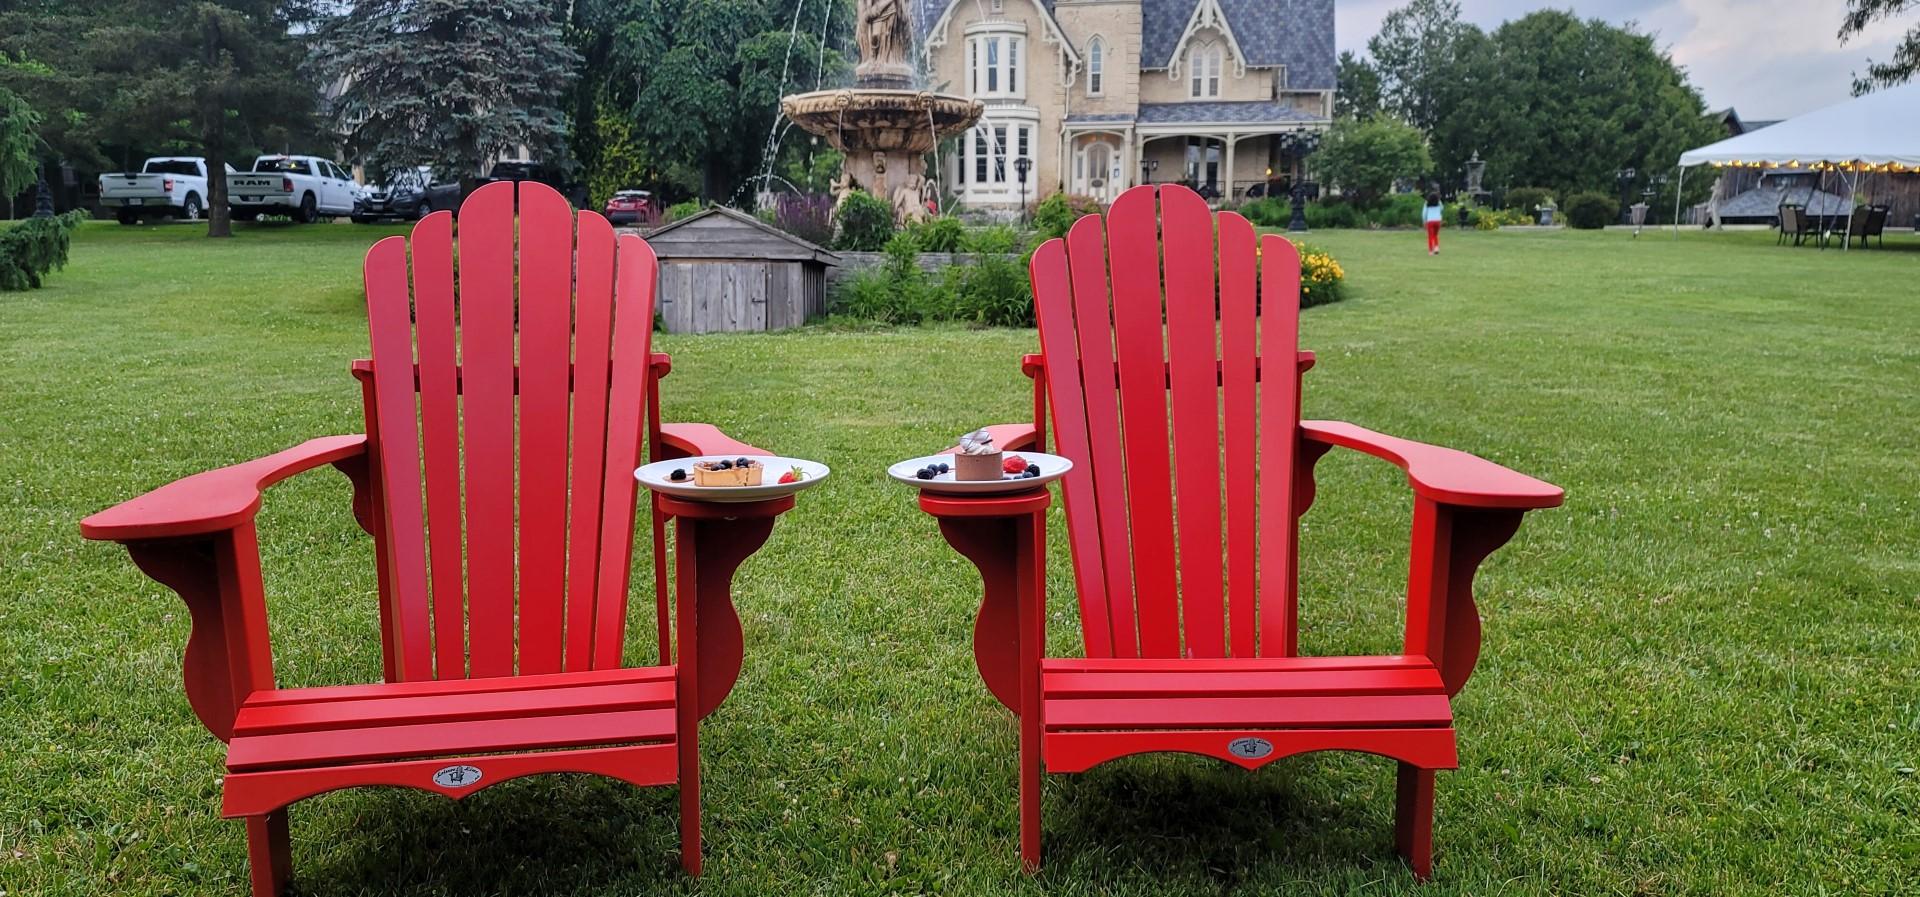 dessert on red muskoka chairs